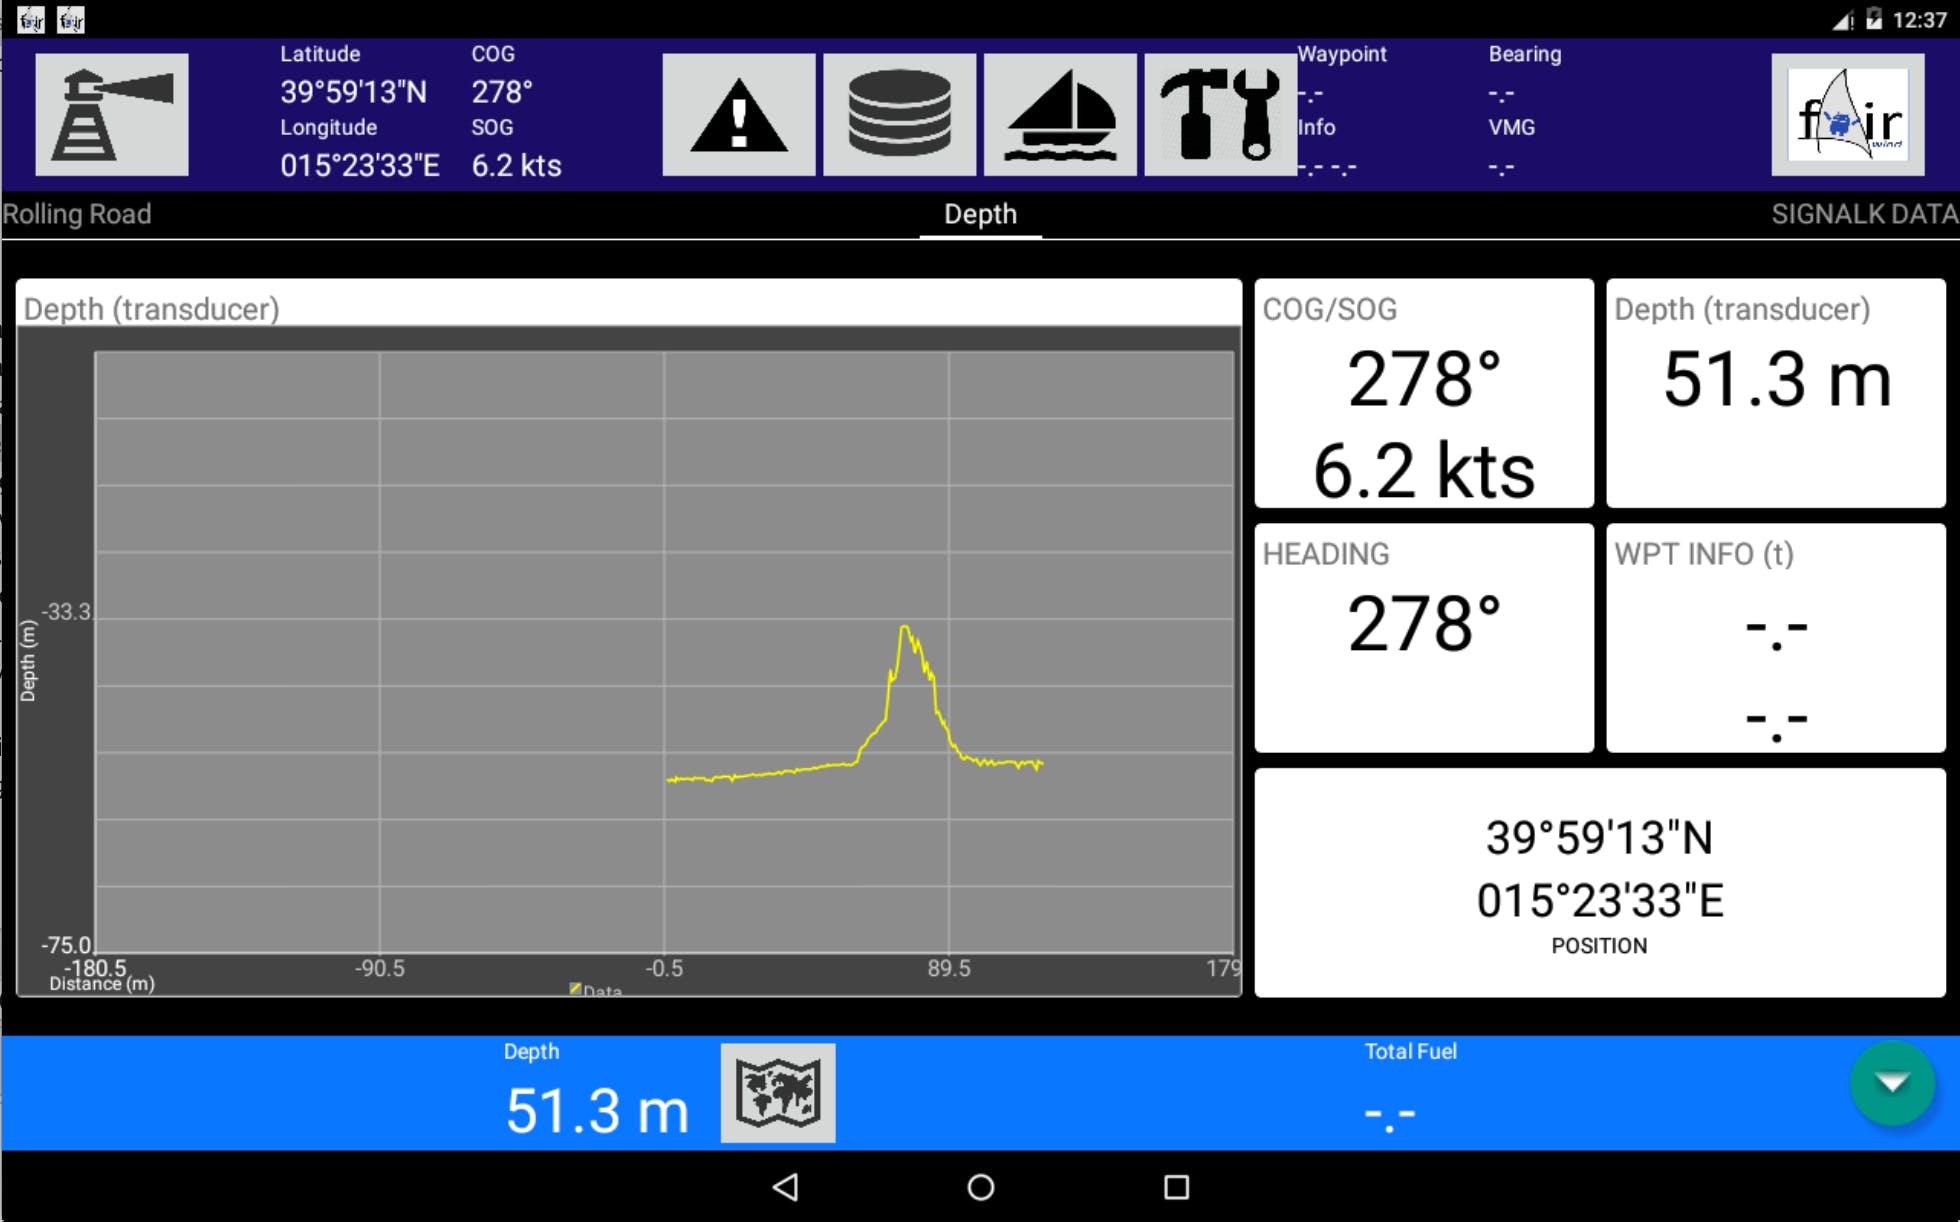 Time based depth profile